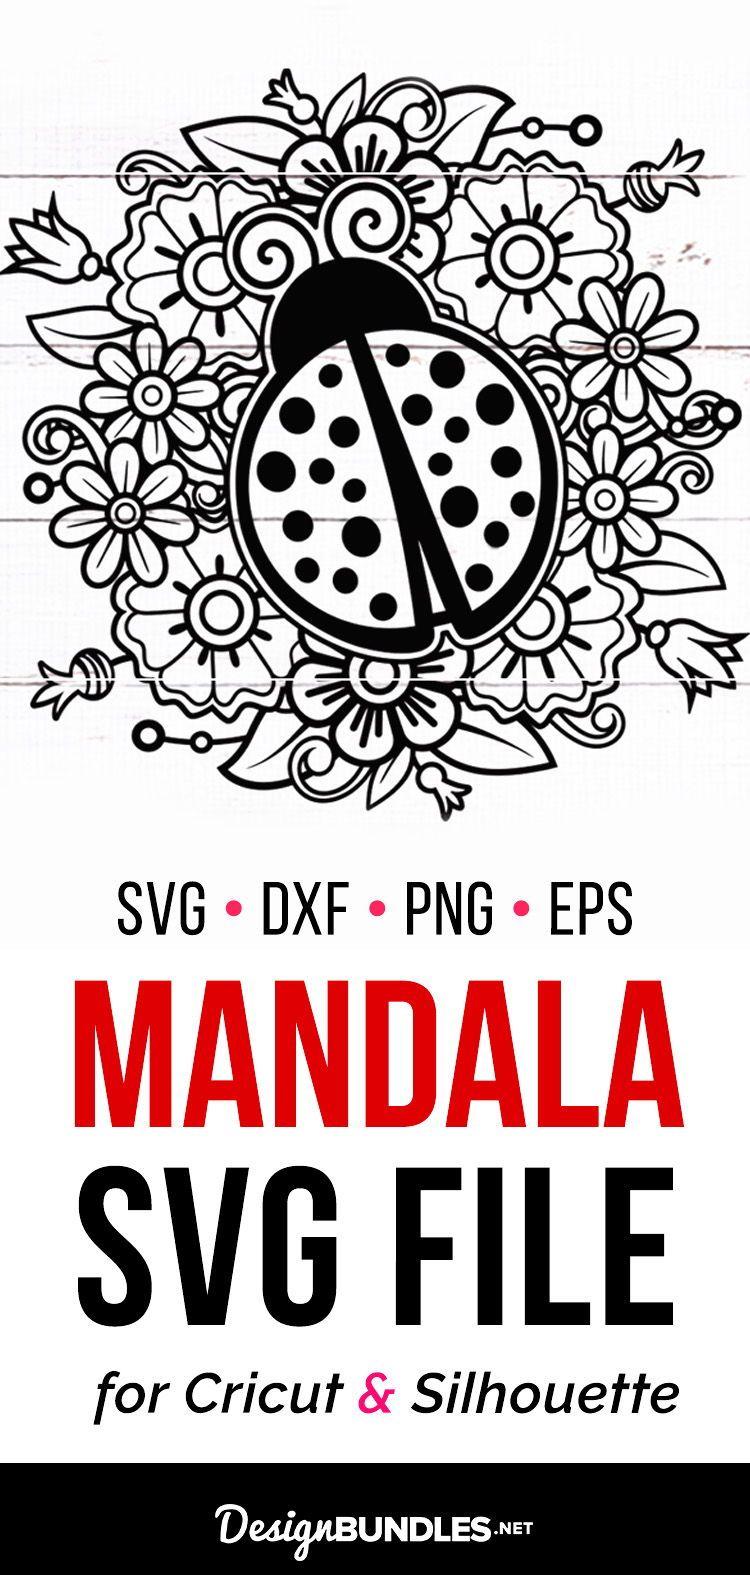 Ladybug Mandala SVG Cut File for Silhouette Cricut